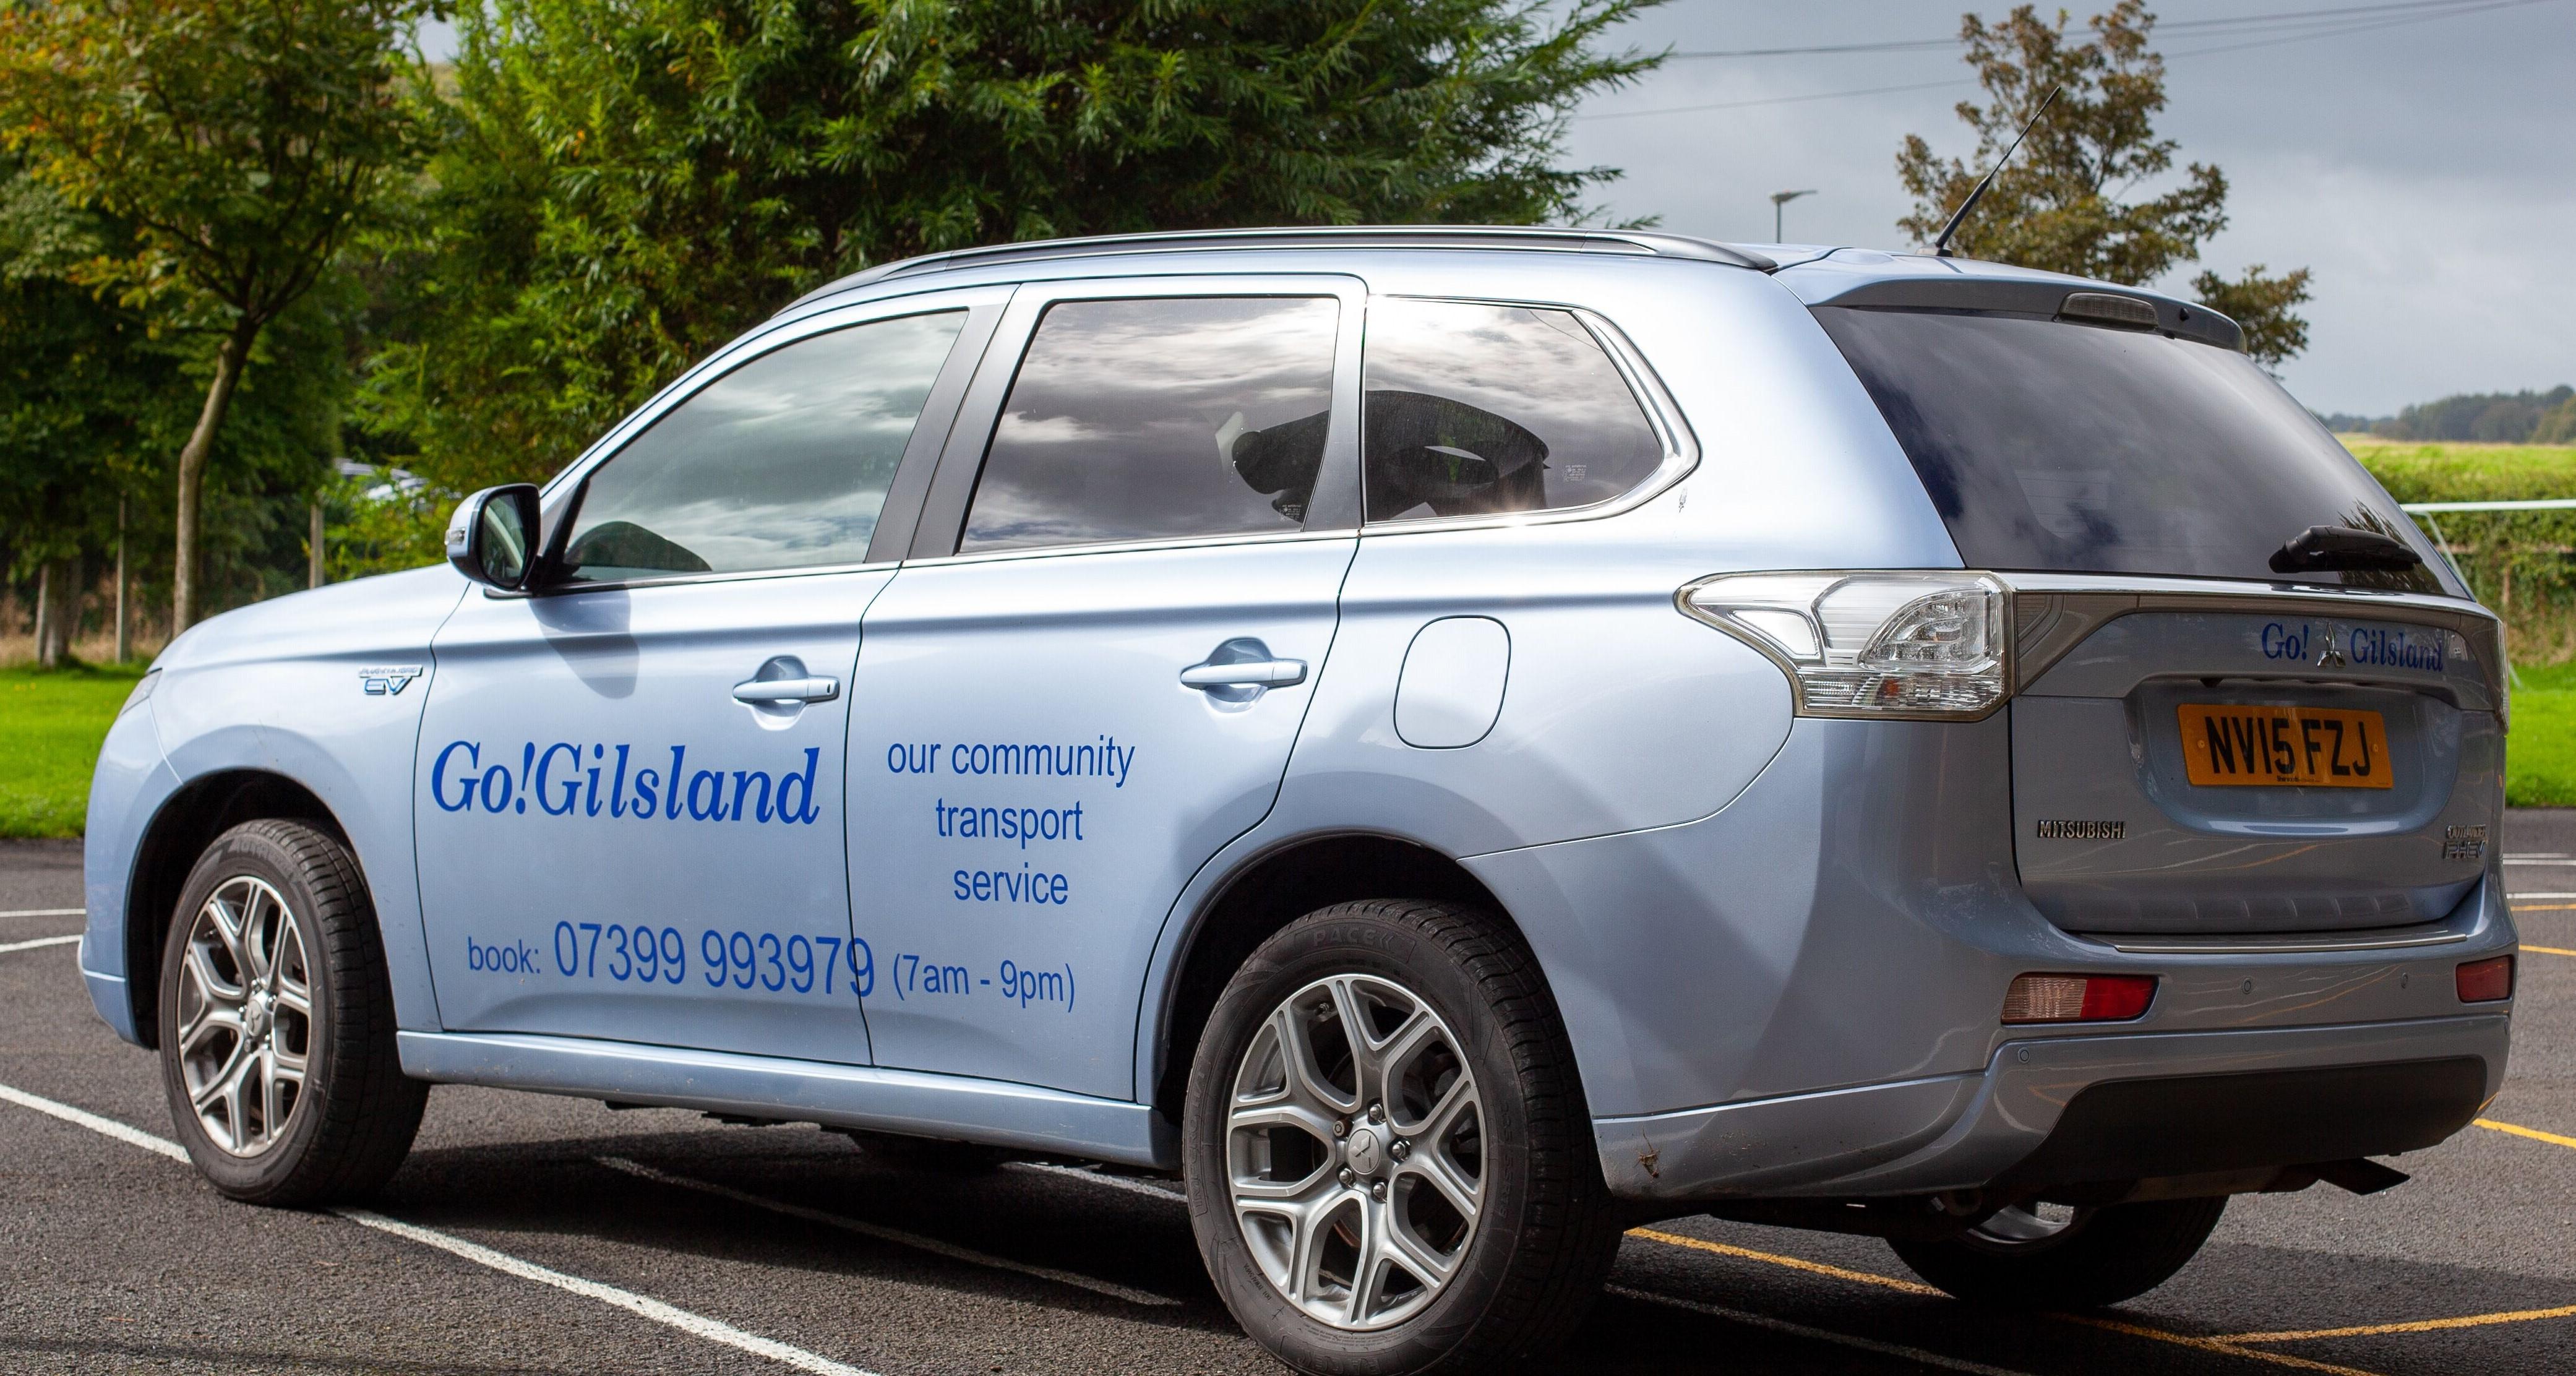 Go Gilsland car